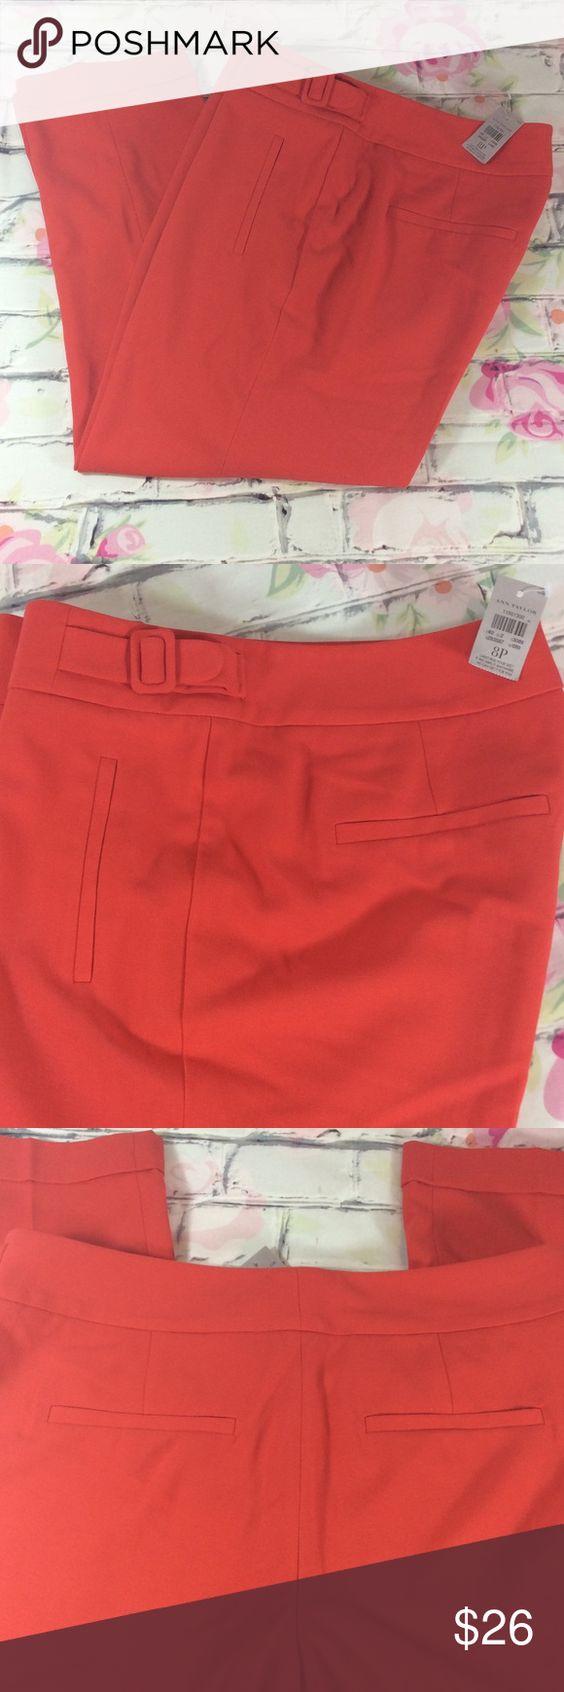 Ann Taylor Petite Cuffed Capri / Ankle Pants~NEW! Ann Taylor Petite Cuffed Capri / Ankle Pants ~ NEW! ~ Coral Color ~ Size 8P Ann Taylor Pants Ankle & Cropped